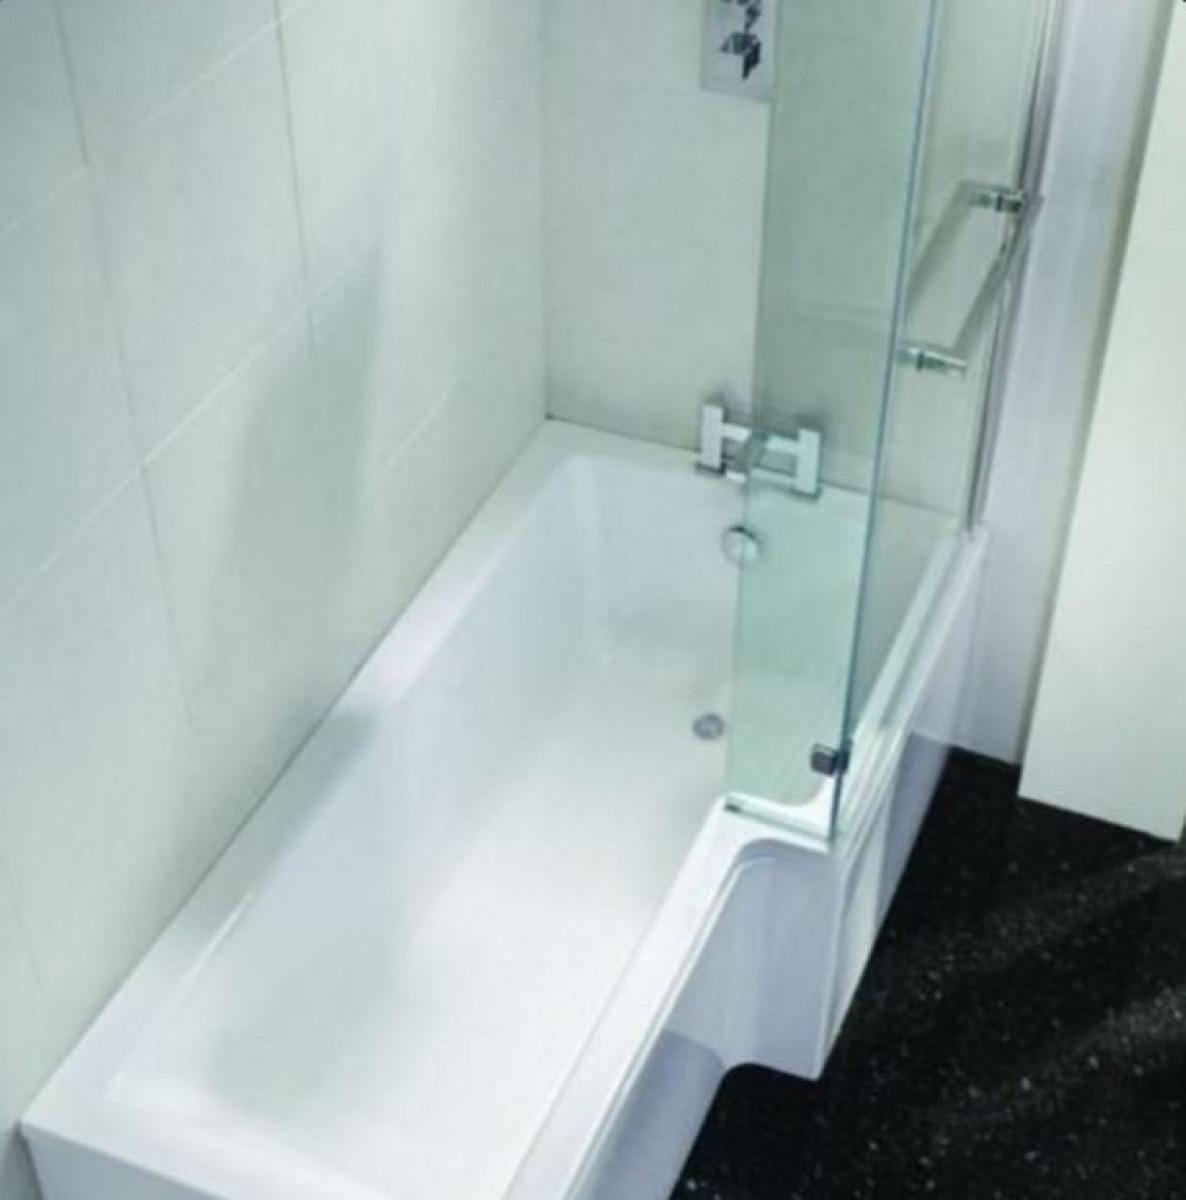 L Shaped Baths 1600mm. l shaped shower bath bathroom suite vanity ...